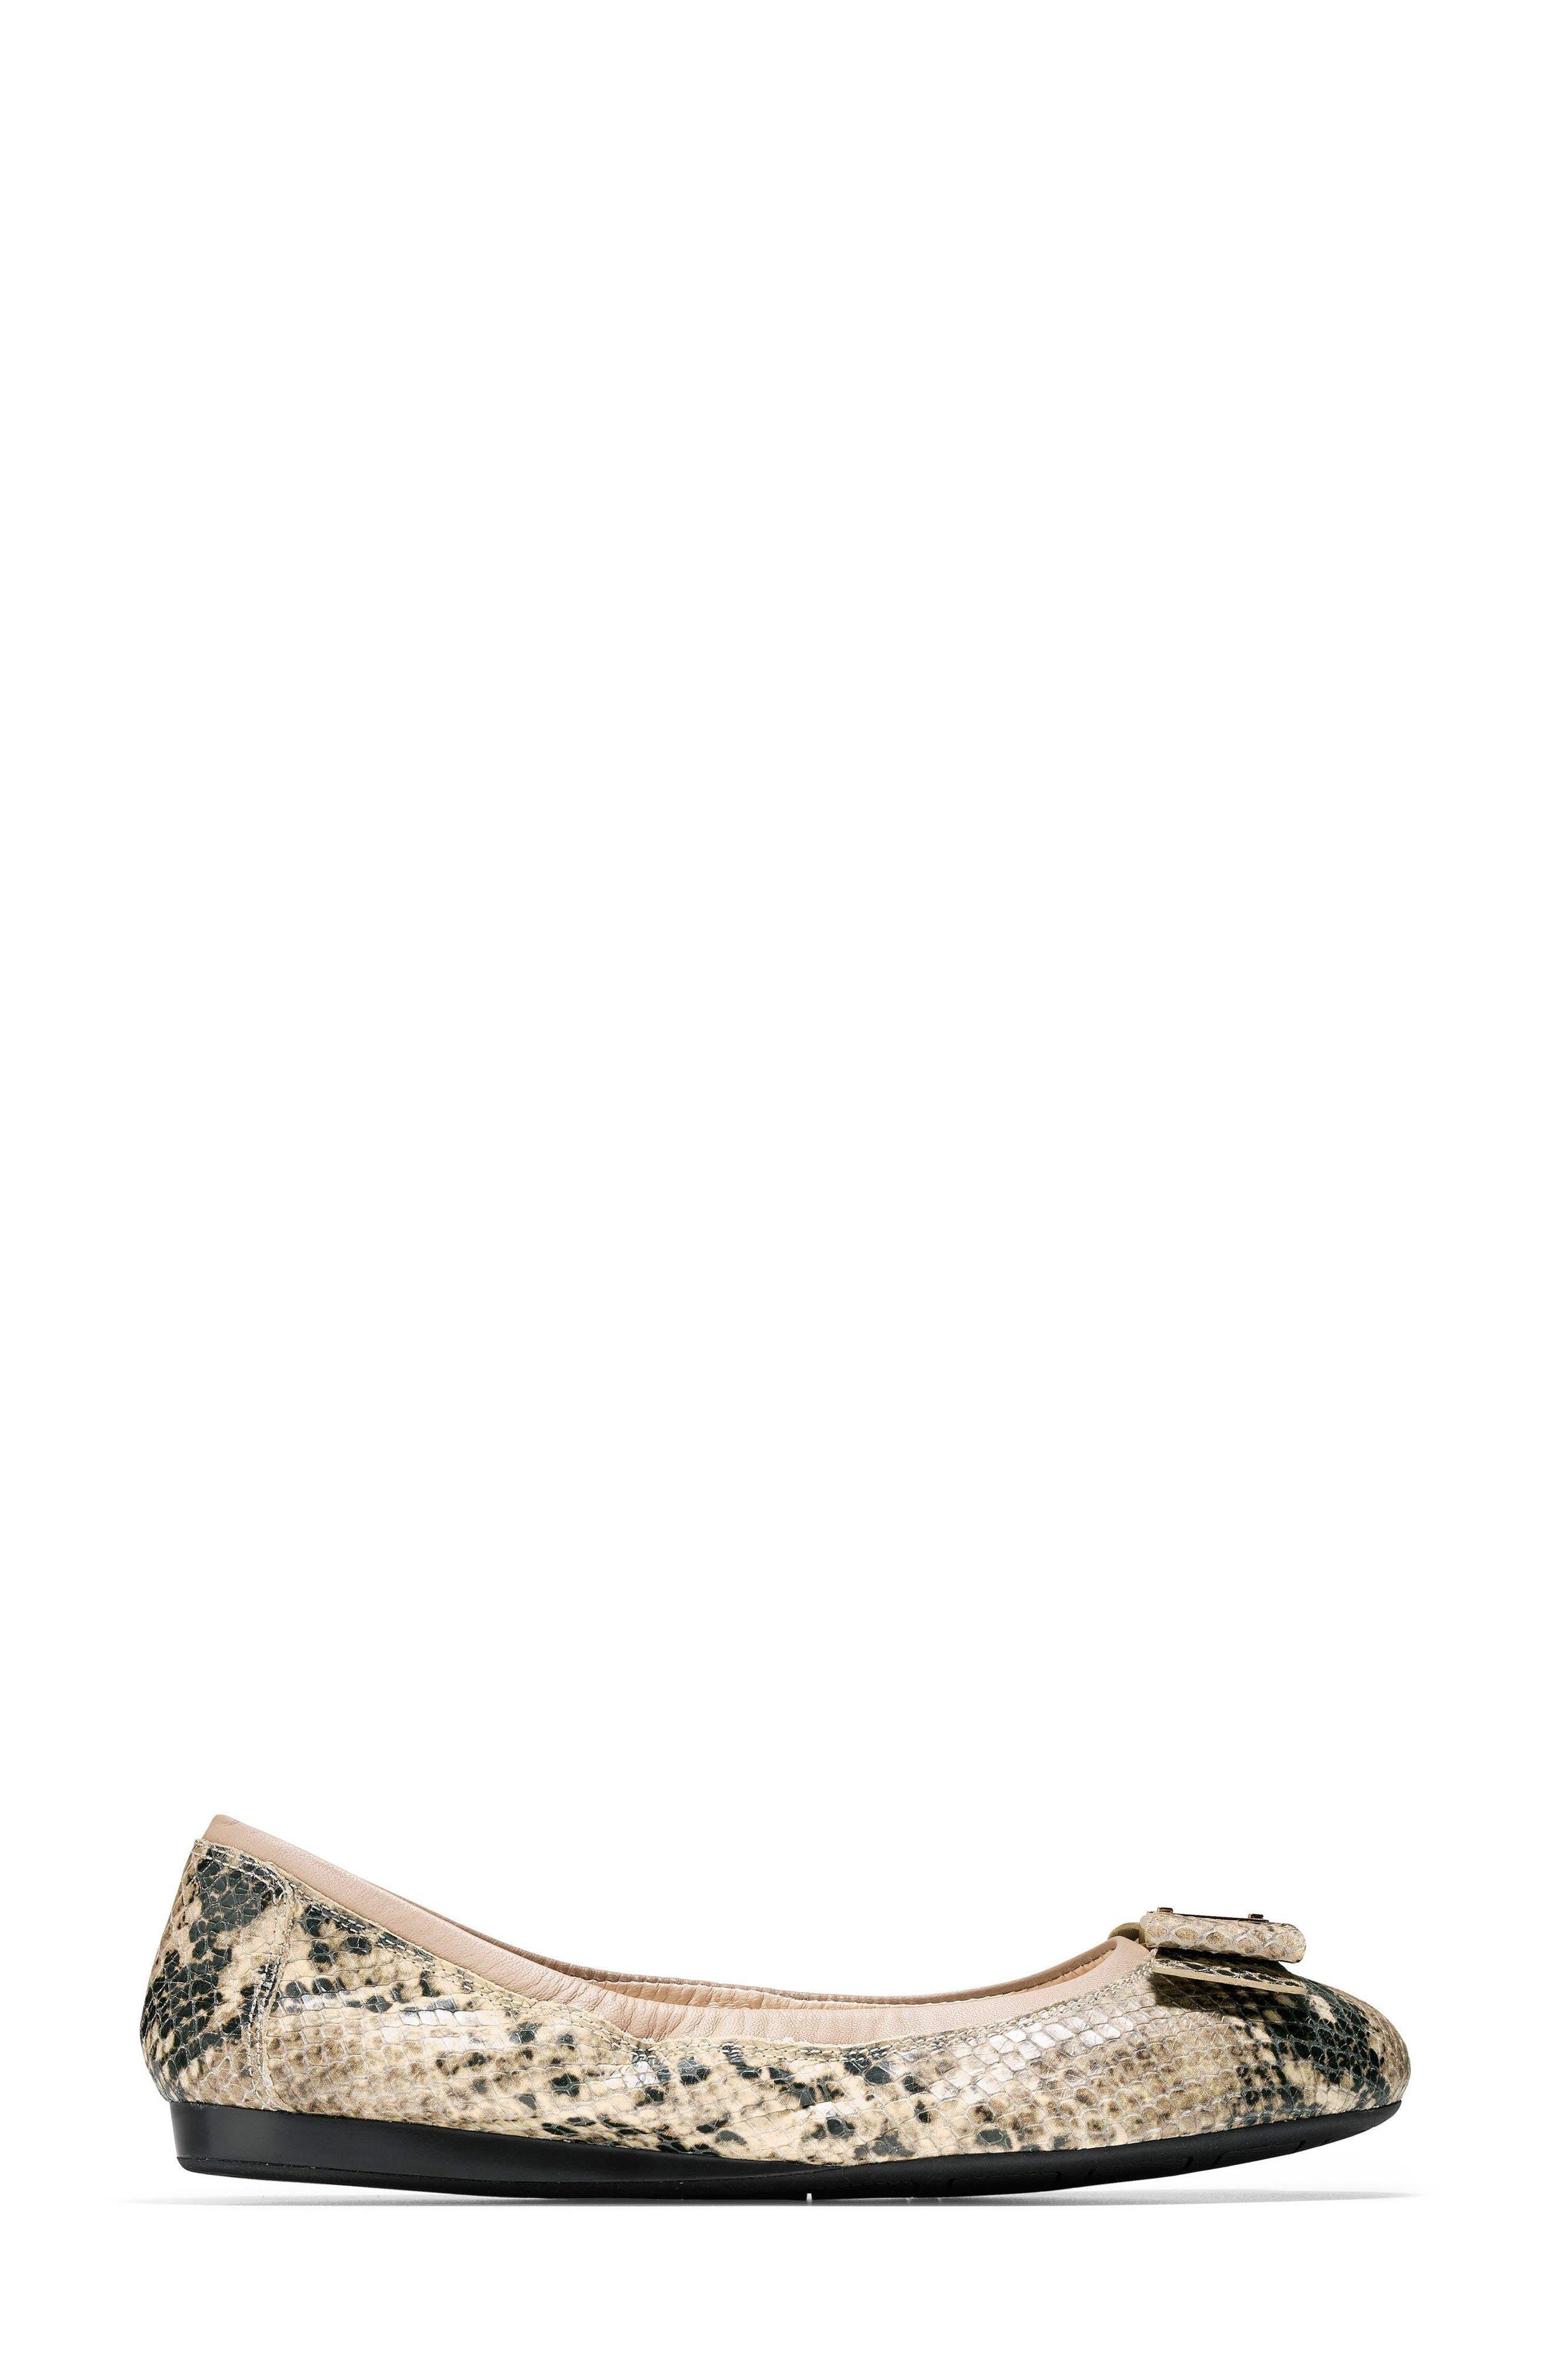 'Tali' Bow Ballet Flat,                             Alternate thumbnail 3, color,                             Roccia Snake Print Leather